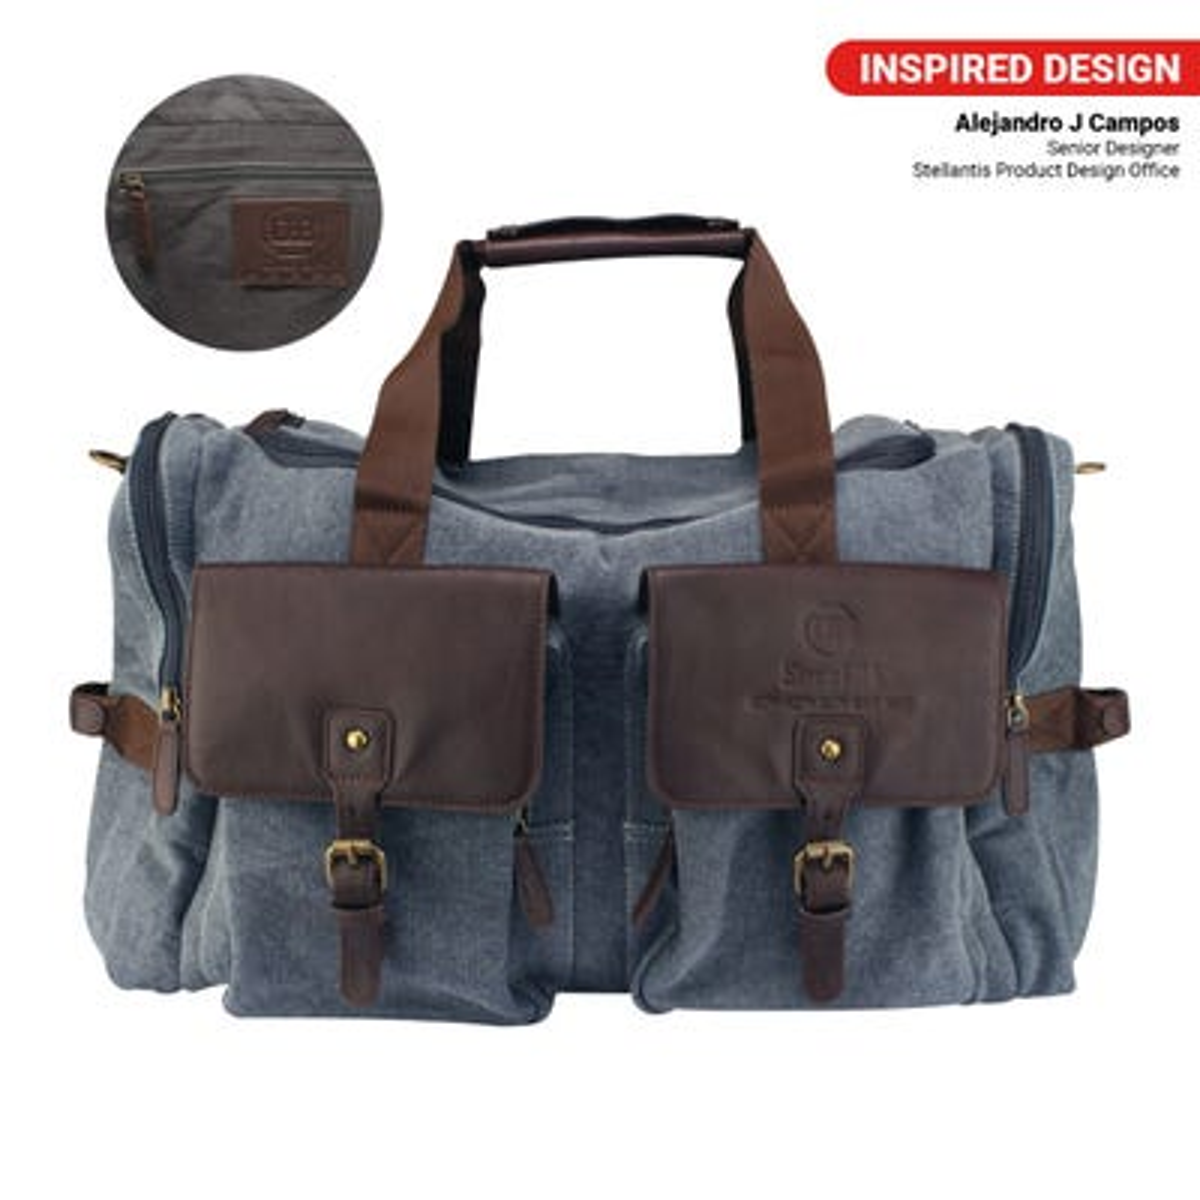 Brothers Duffel Bag